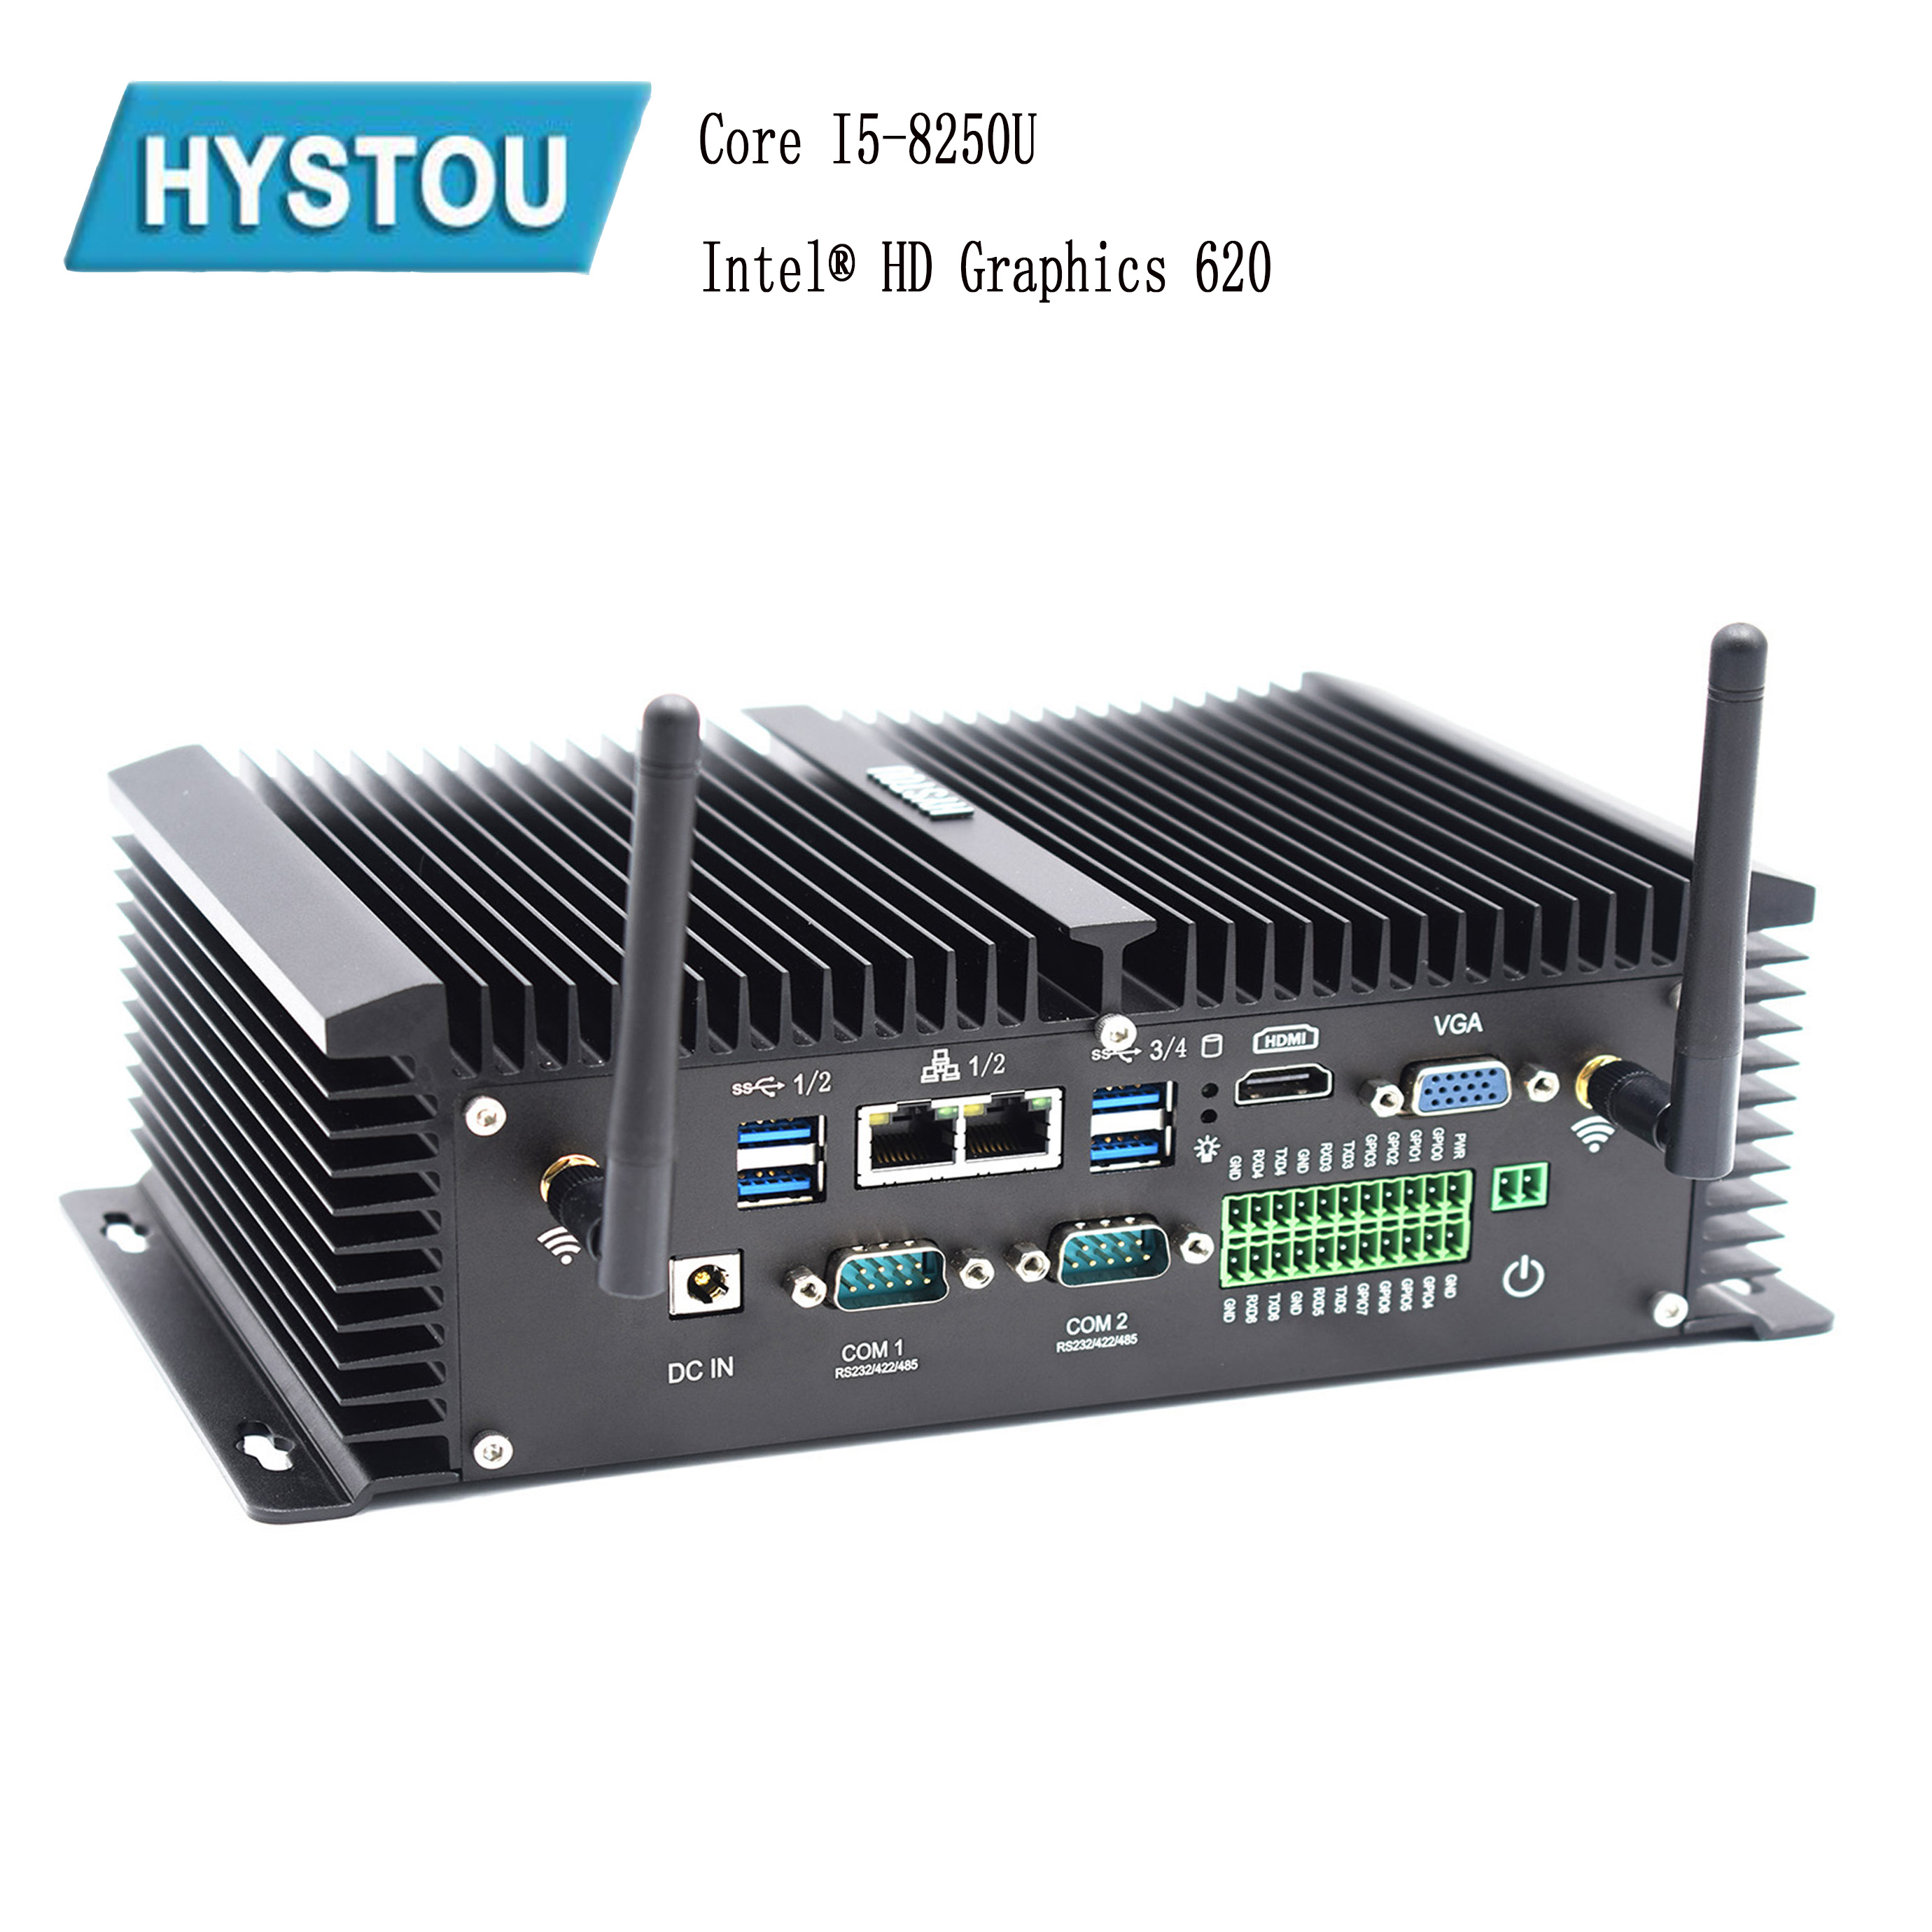 Hystou 2019 Mini Pc 4k Support I5 8250u Ddr4 4G SIM GPIO Port Windows10 Linux Pfsence Fanless Industrial Computer Rs232 R485 Com